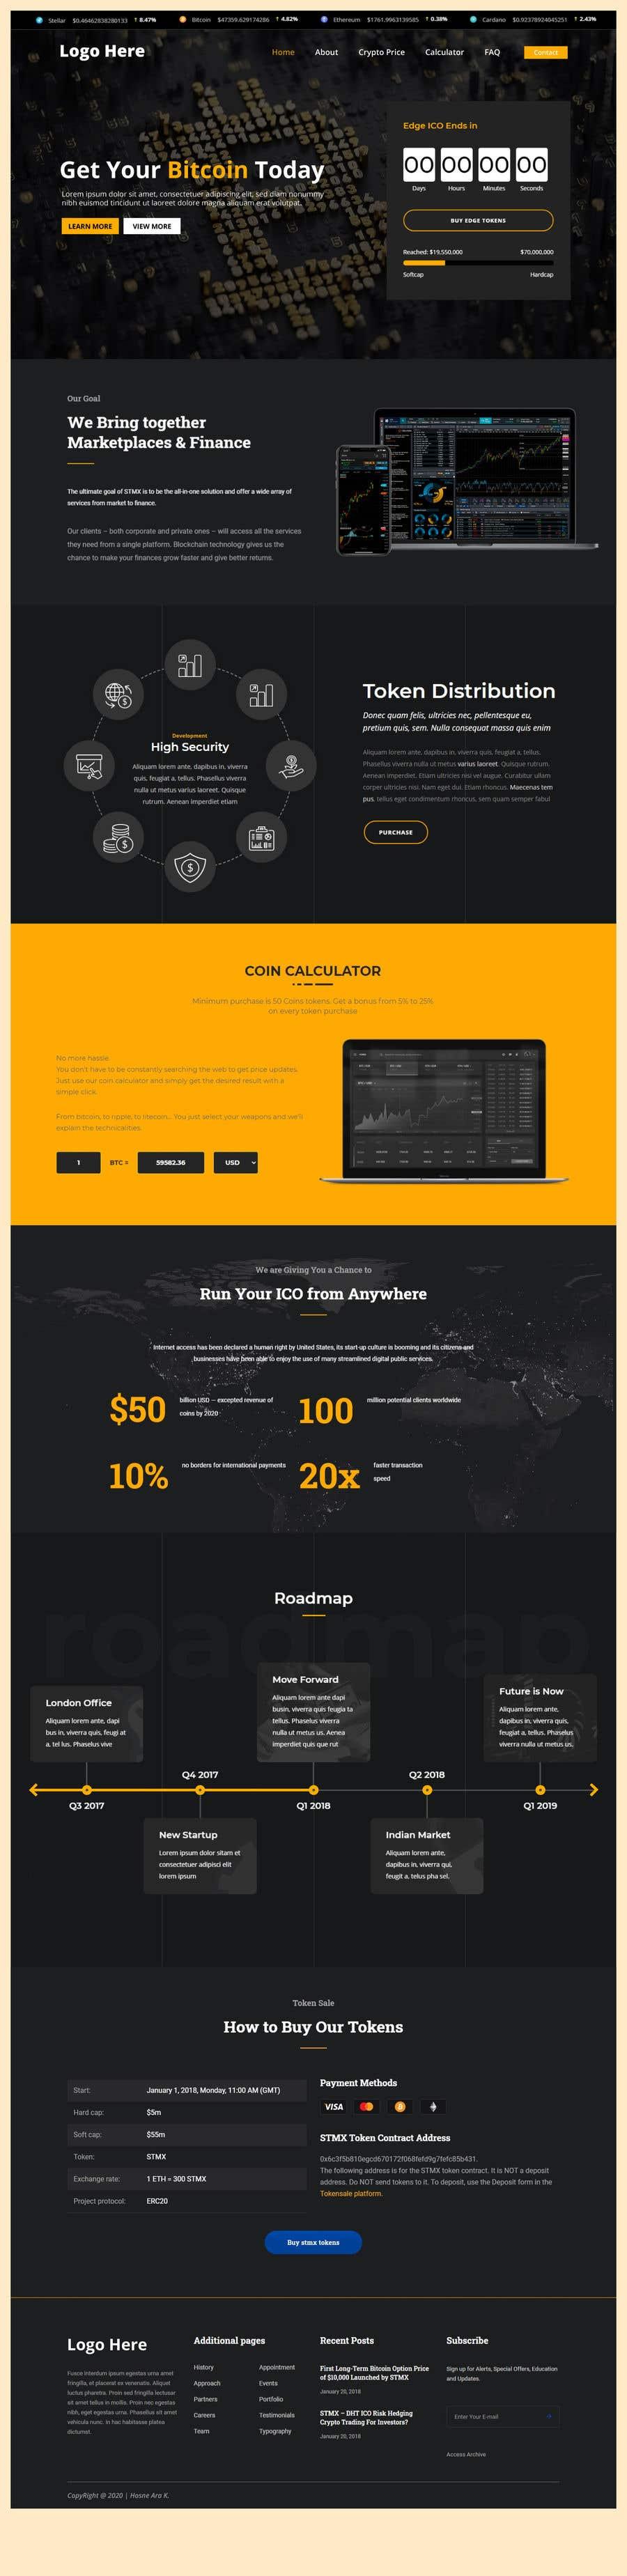 Penyertaan Peraduan #                                        3                                      untuk                                         Contest – Crypto Information Website Section: $100